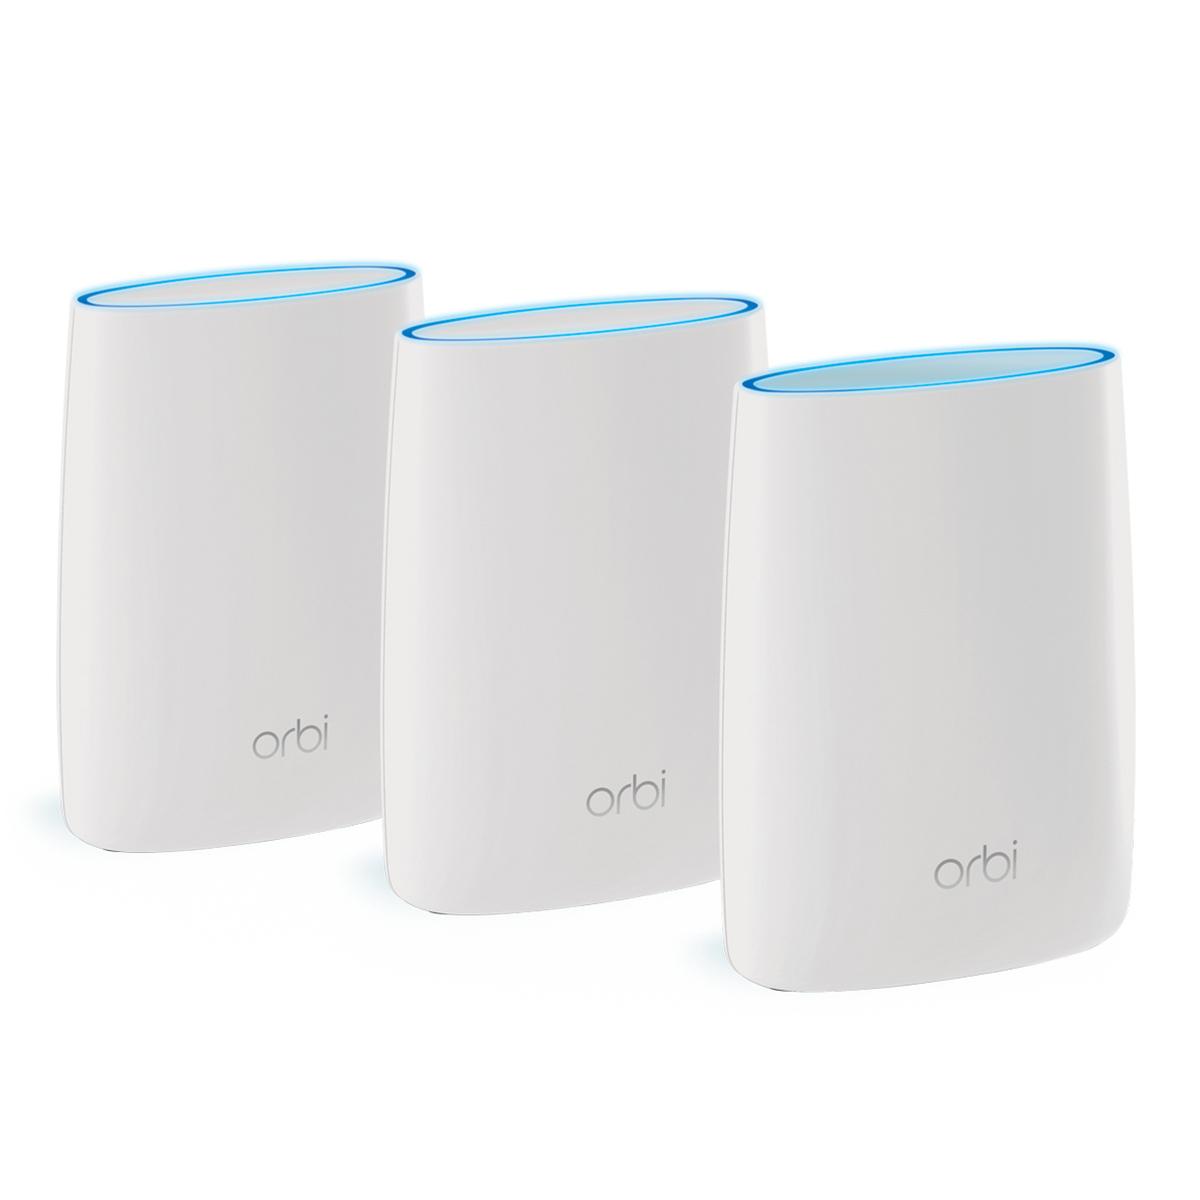 Netgear Orbi 高效能AC3000三頻WiFi延伸系統組合 (RBK53)